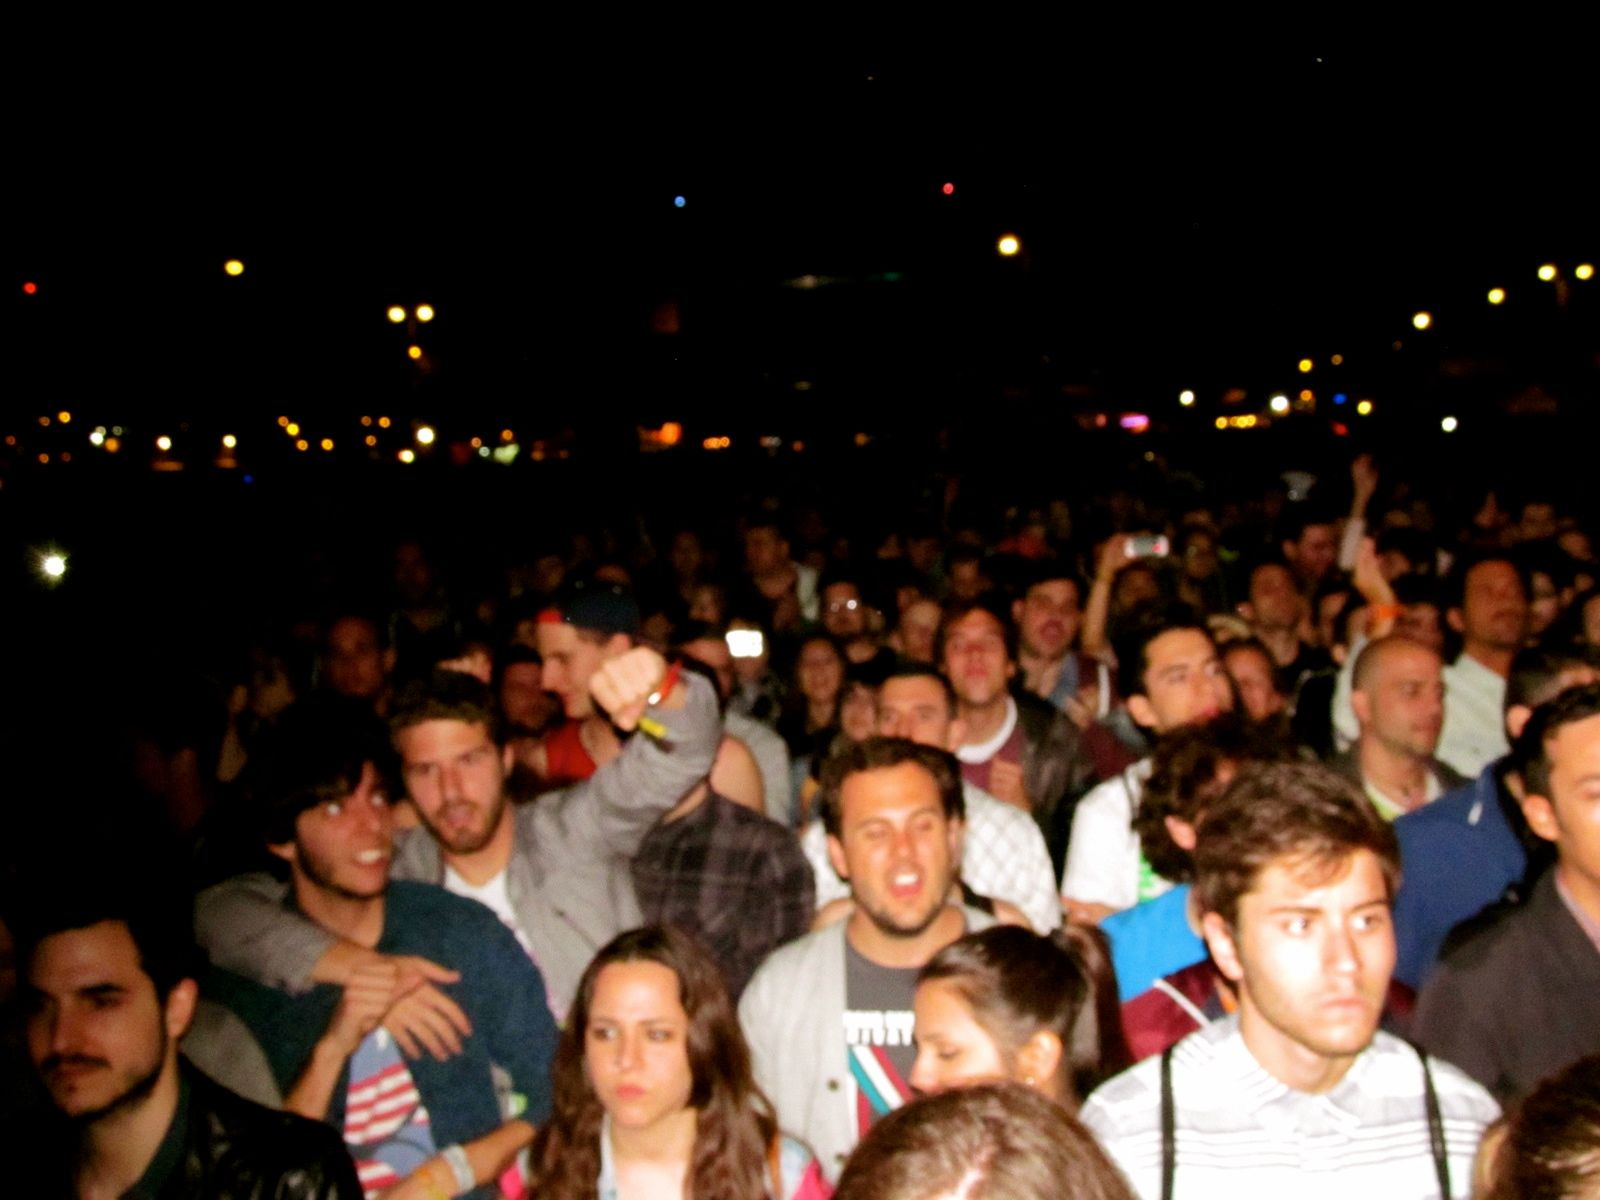 sos 4.8, murcia, festival, m83, crowd, josh taylor